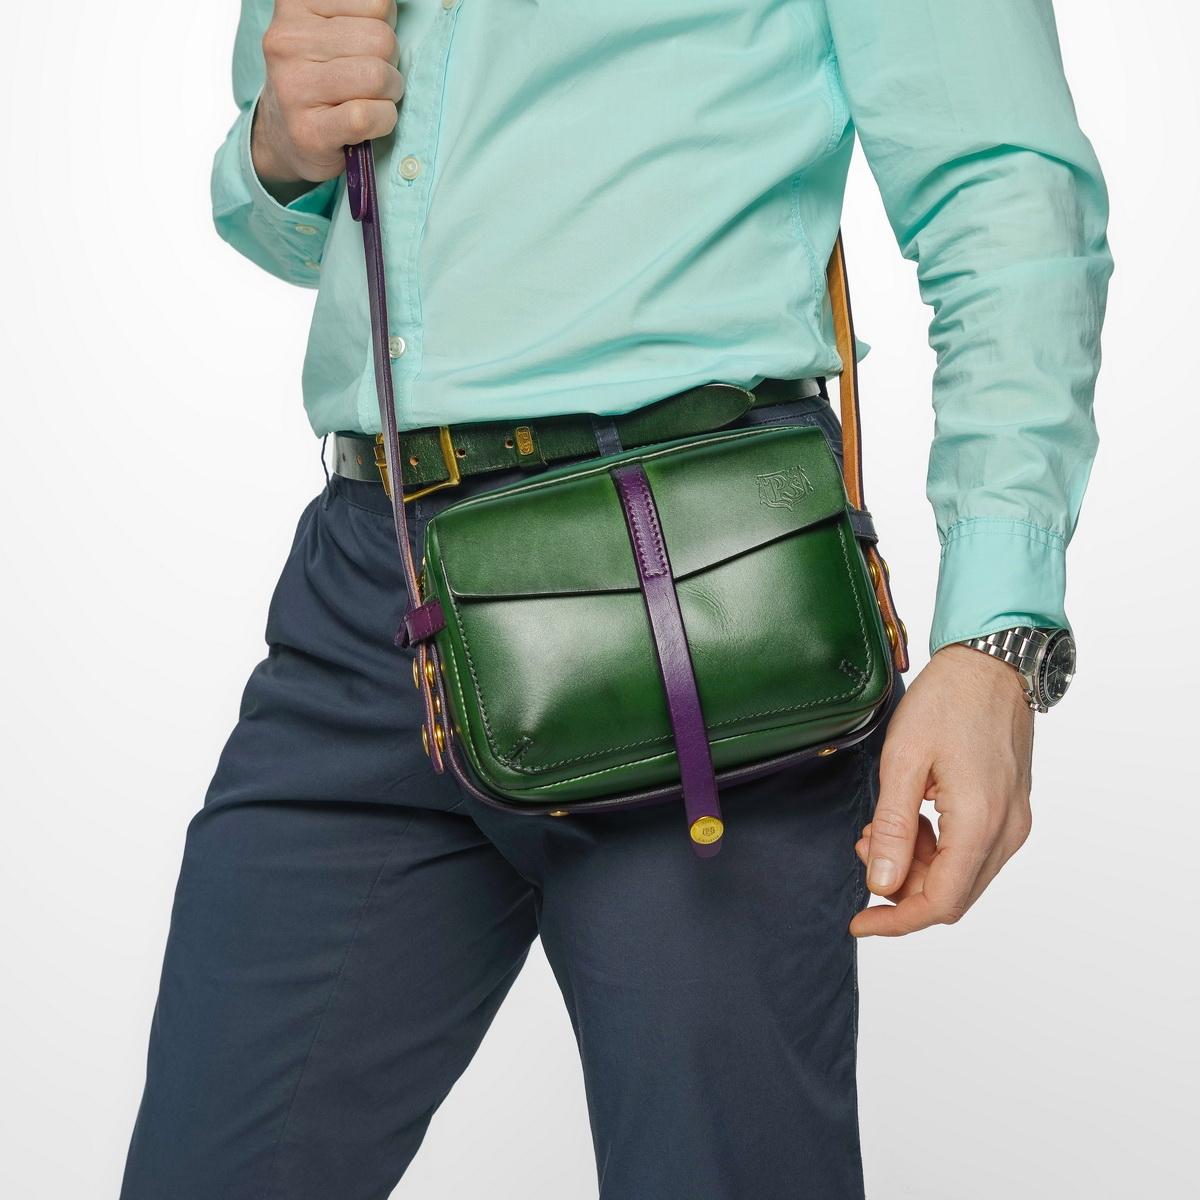 Smart crossbody bag - clutch PUFF violet ink & grassy green